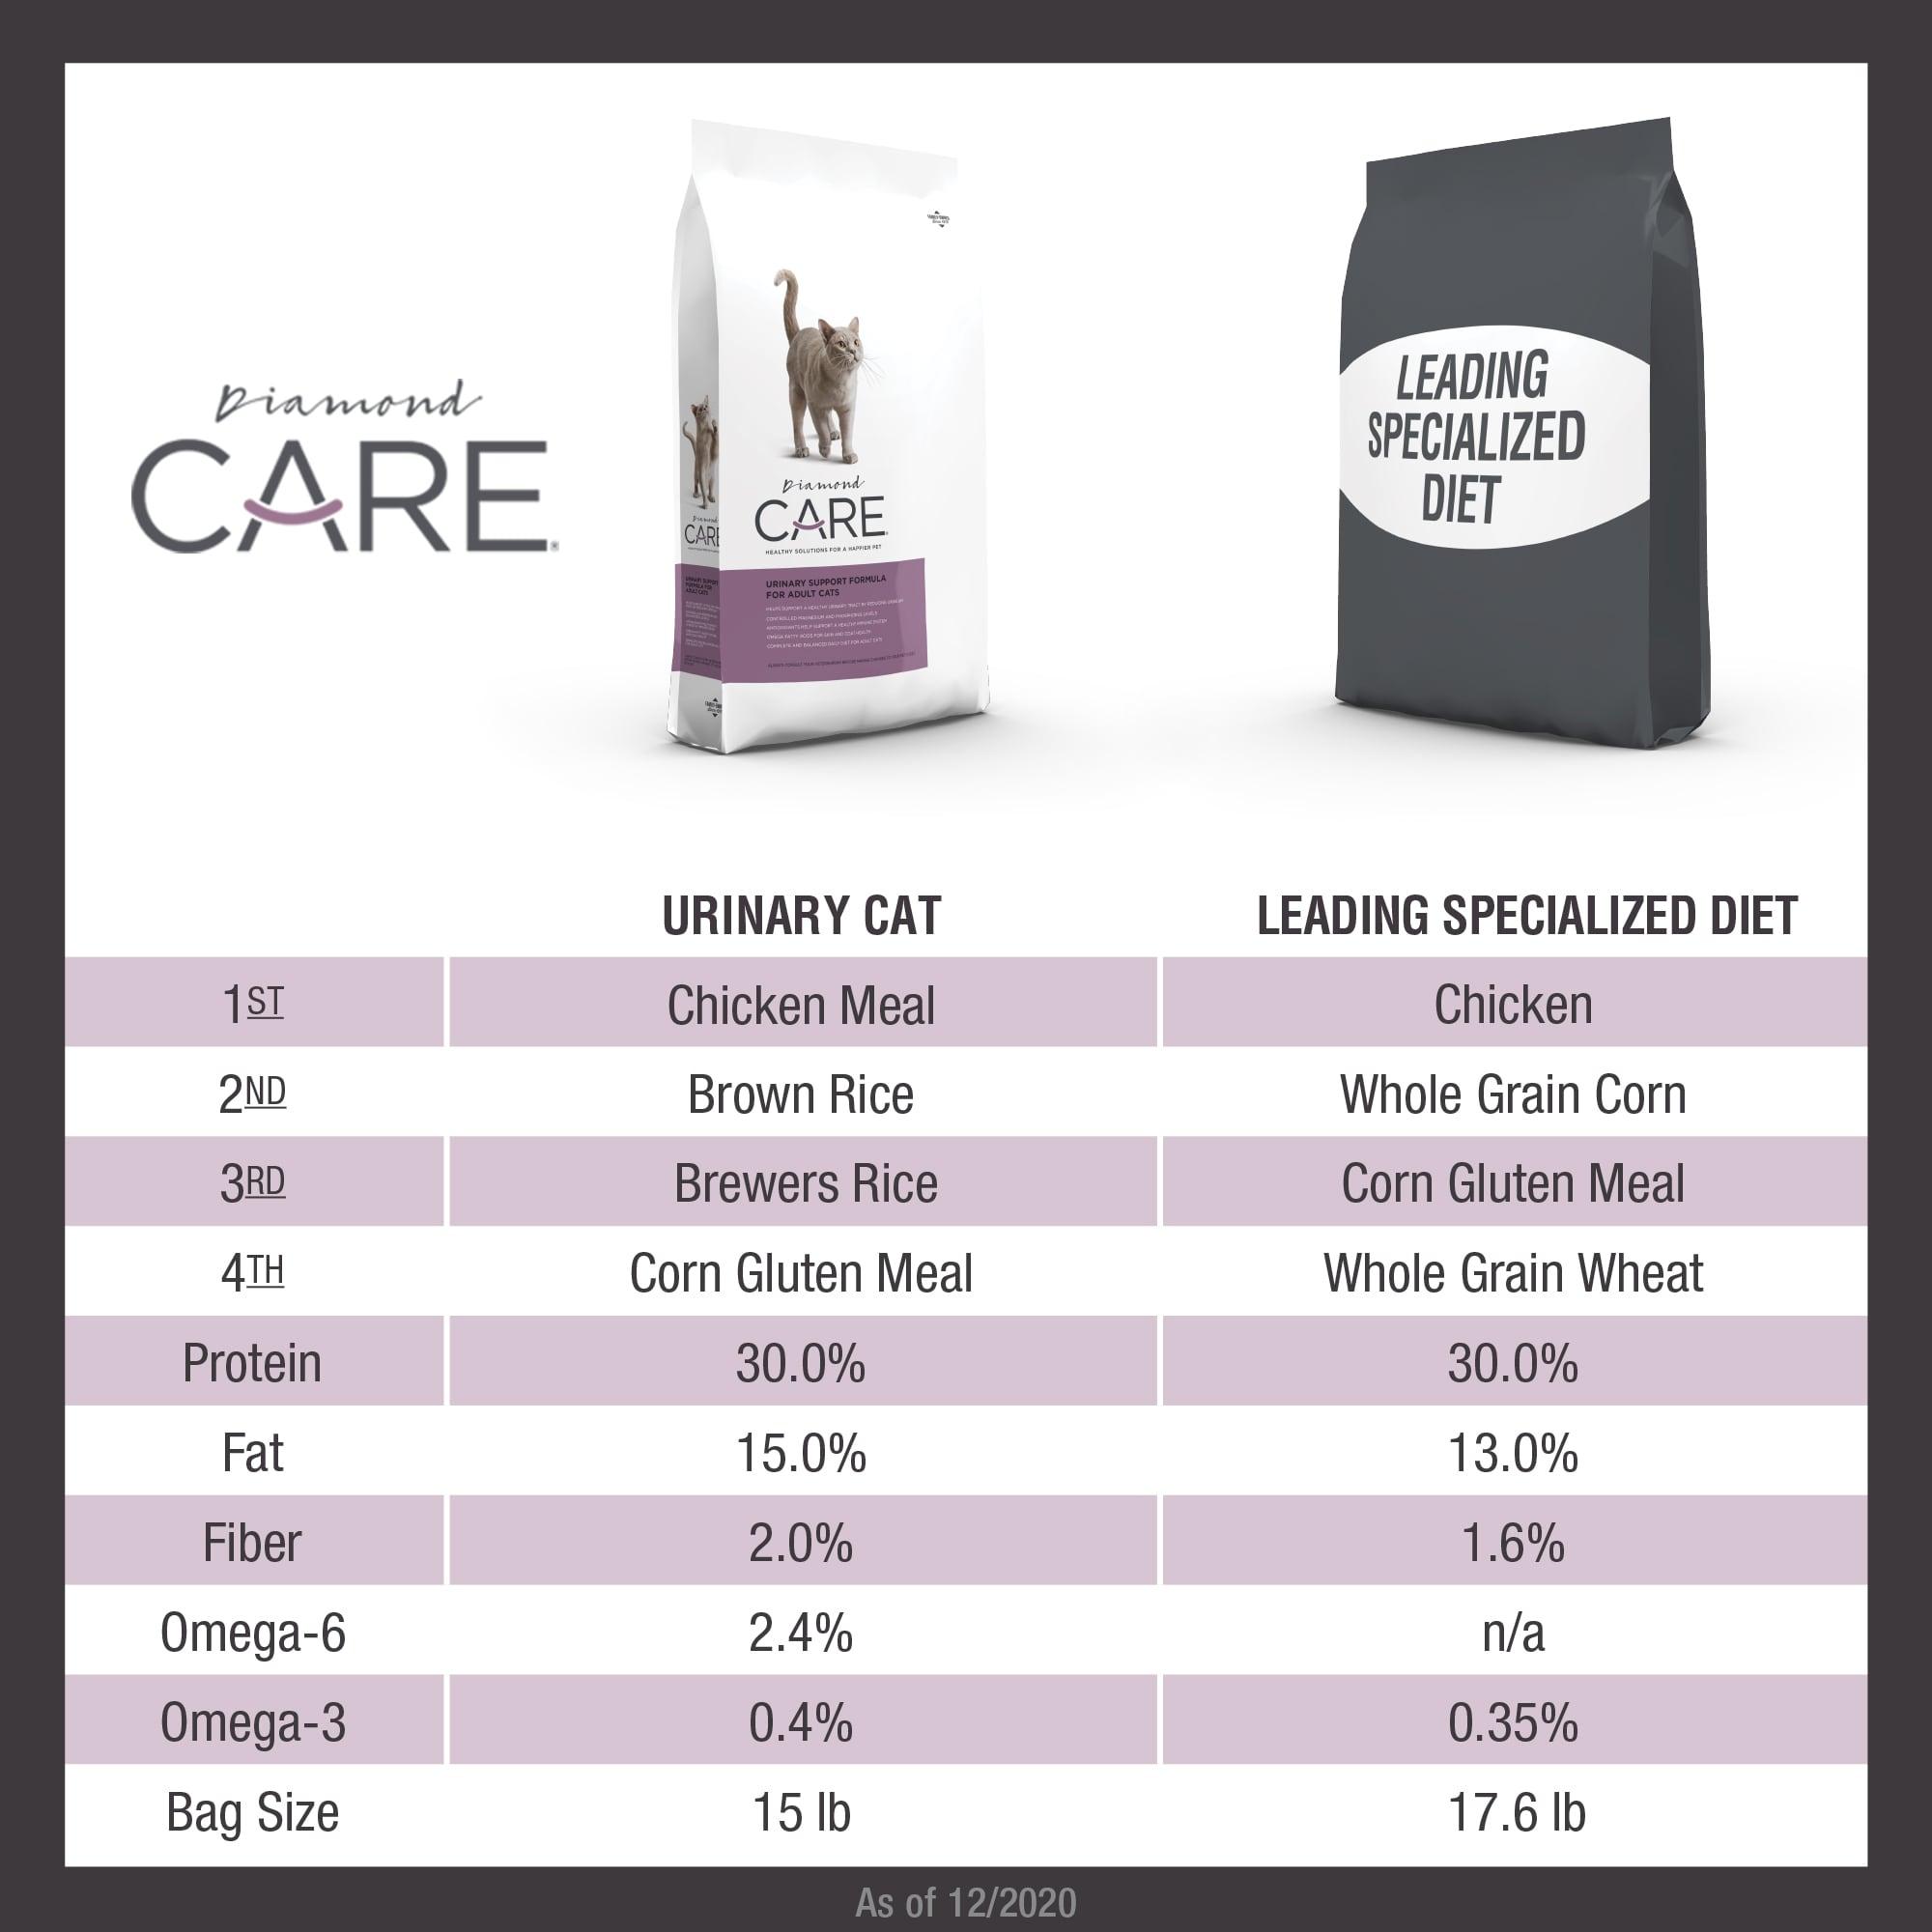 Diamond CARE Urinary Formula for Cats comparison chart   Diamond Pet Foods